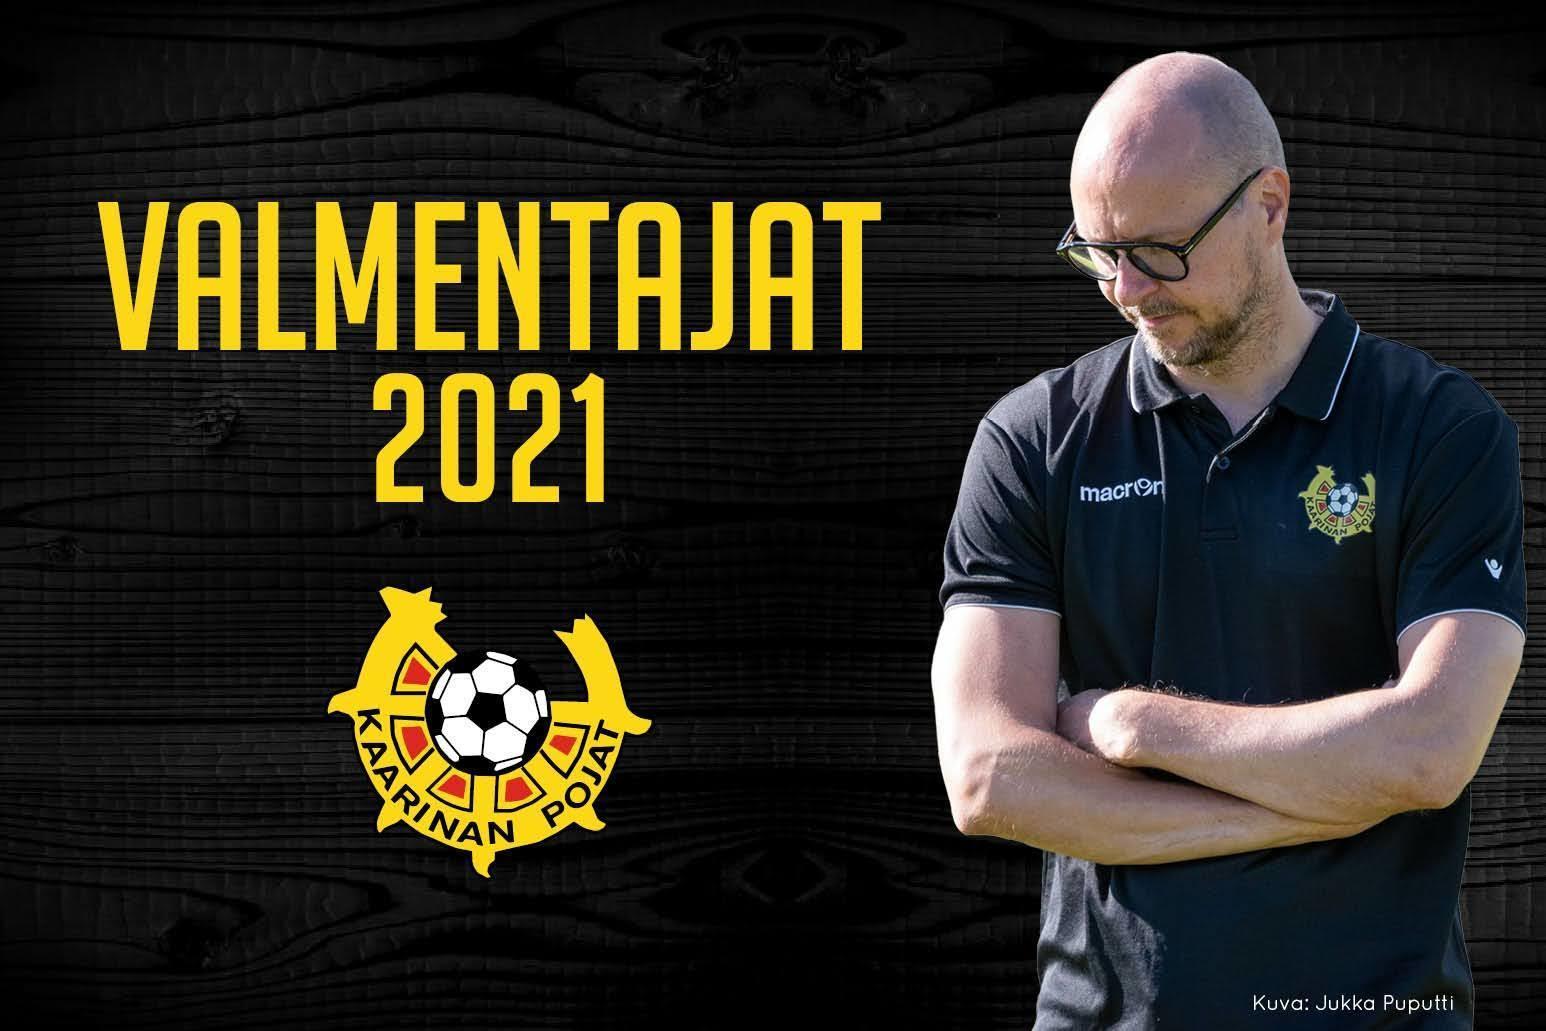 KaaPon valmentajapaketti kaudelle 2021 on lähes valmis